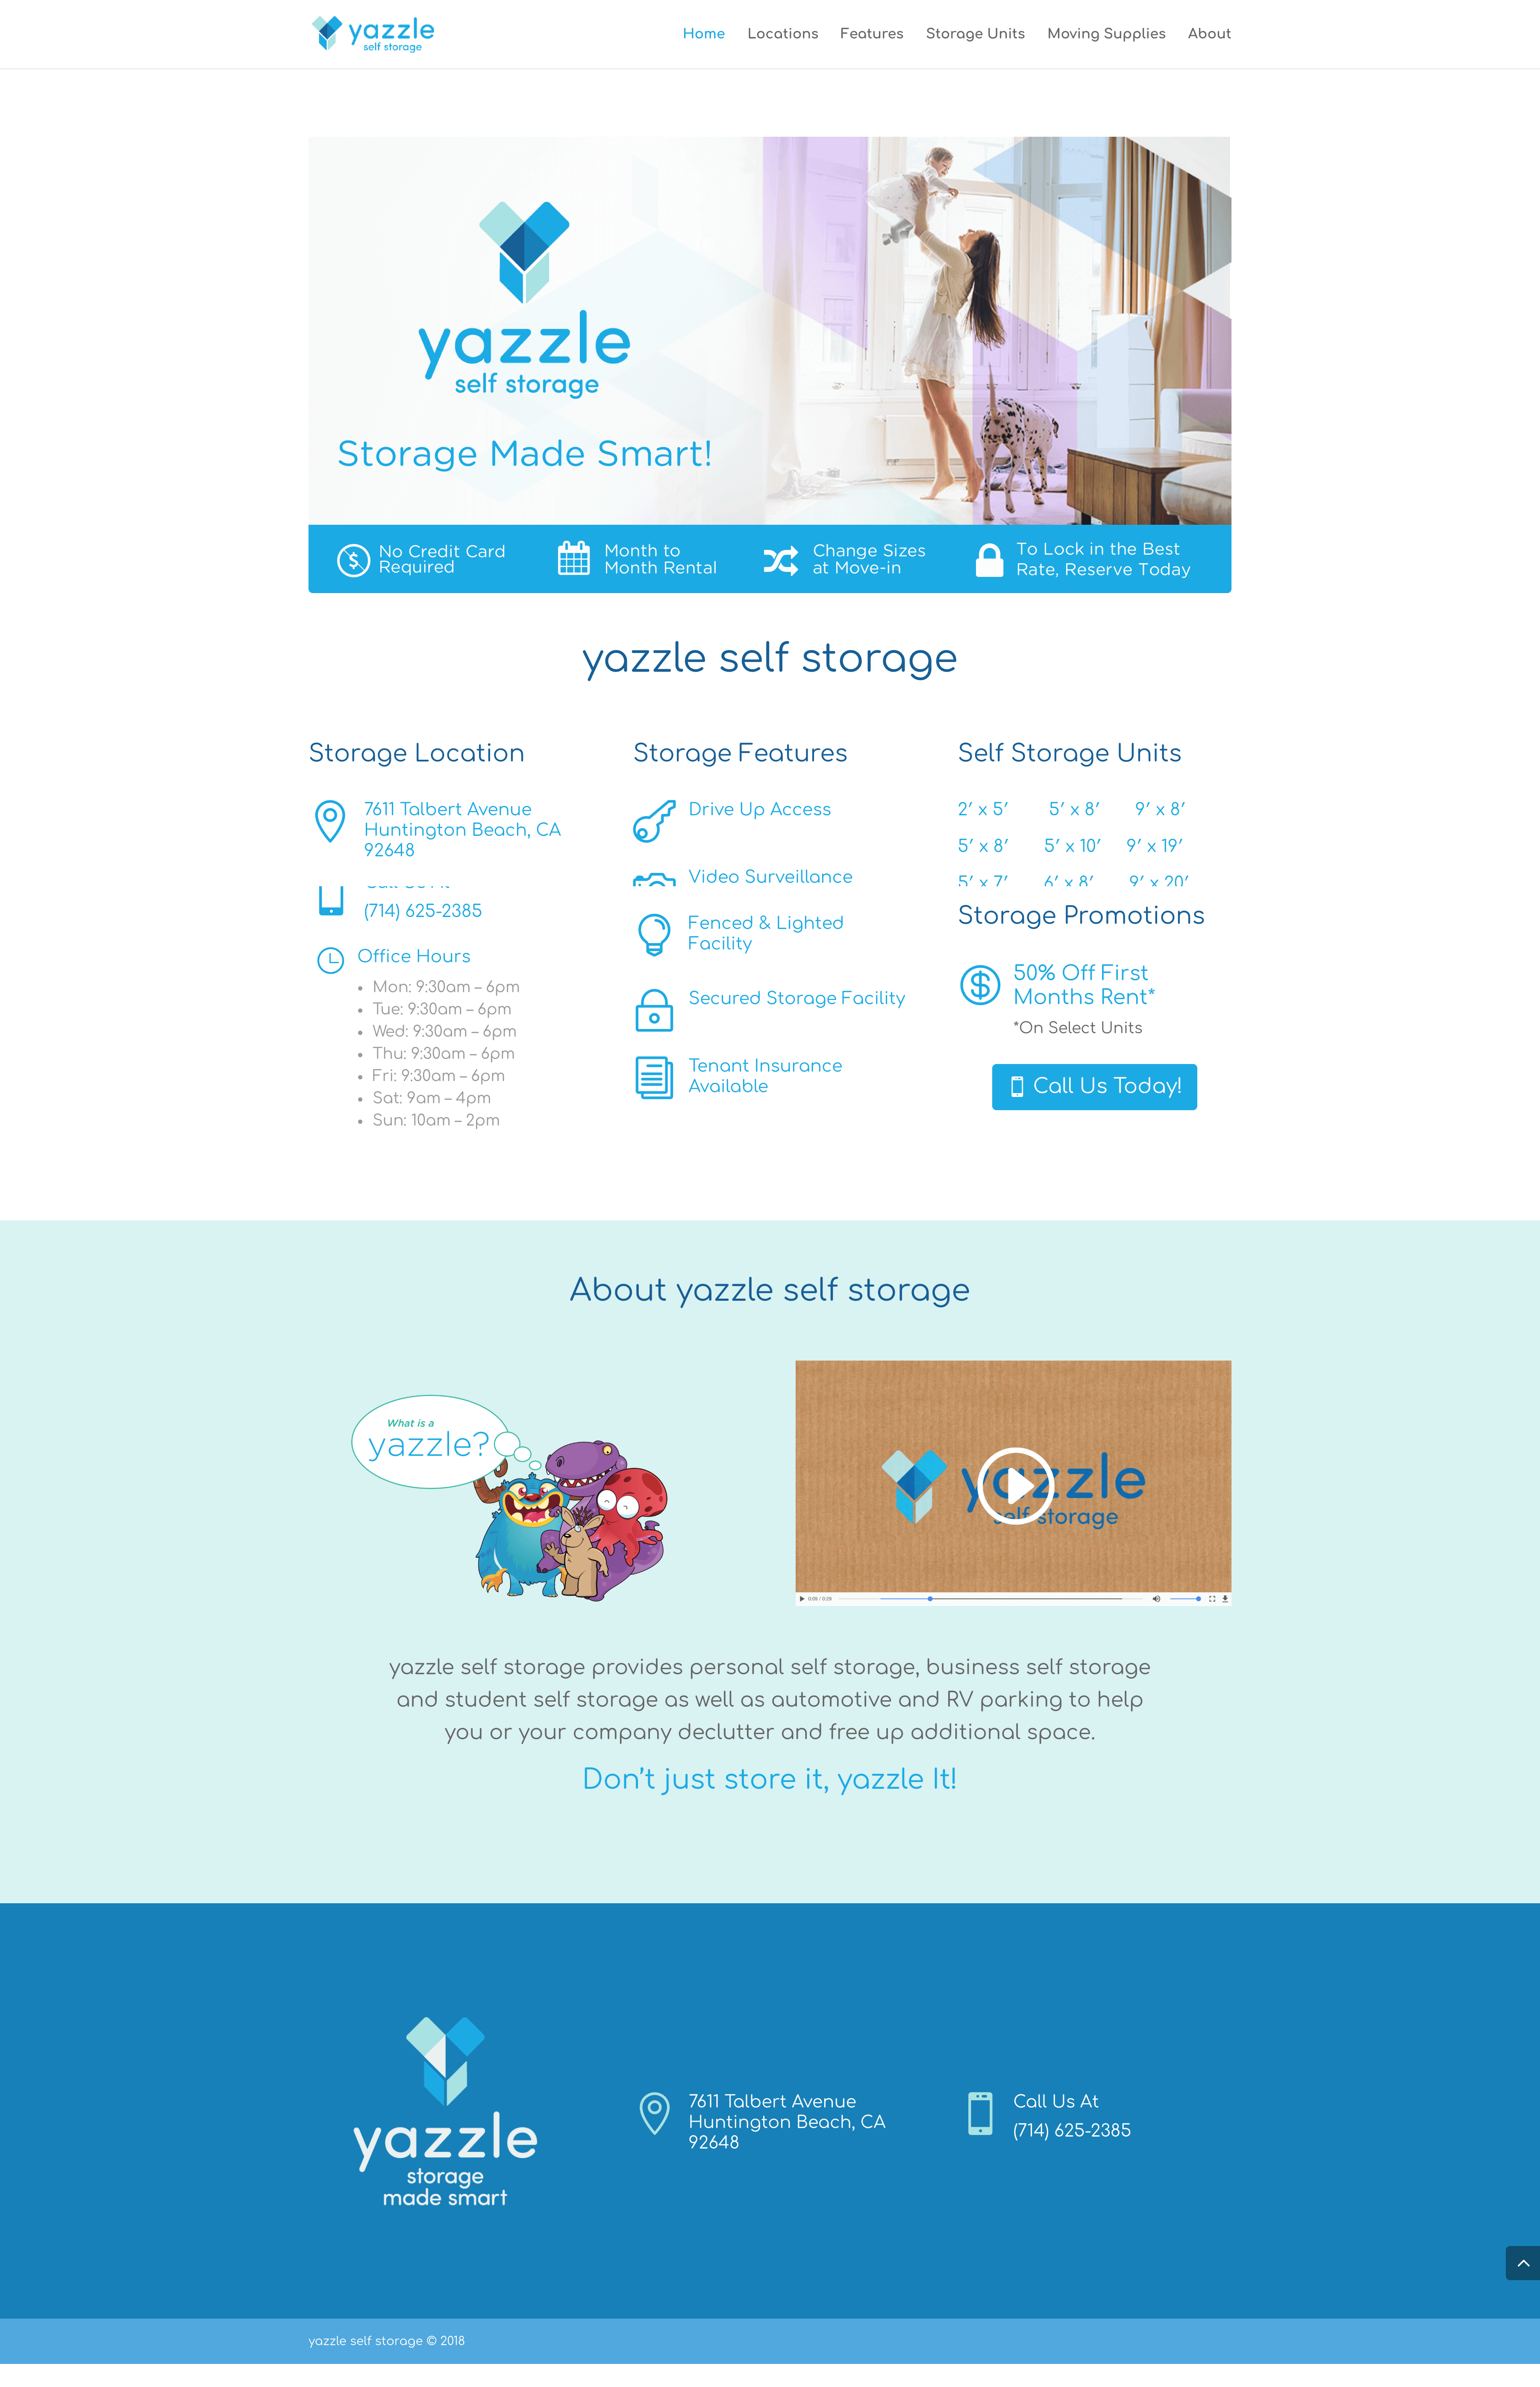 Yazzle-Self-Storage-Units-Website-Design-Home-Page